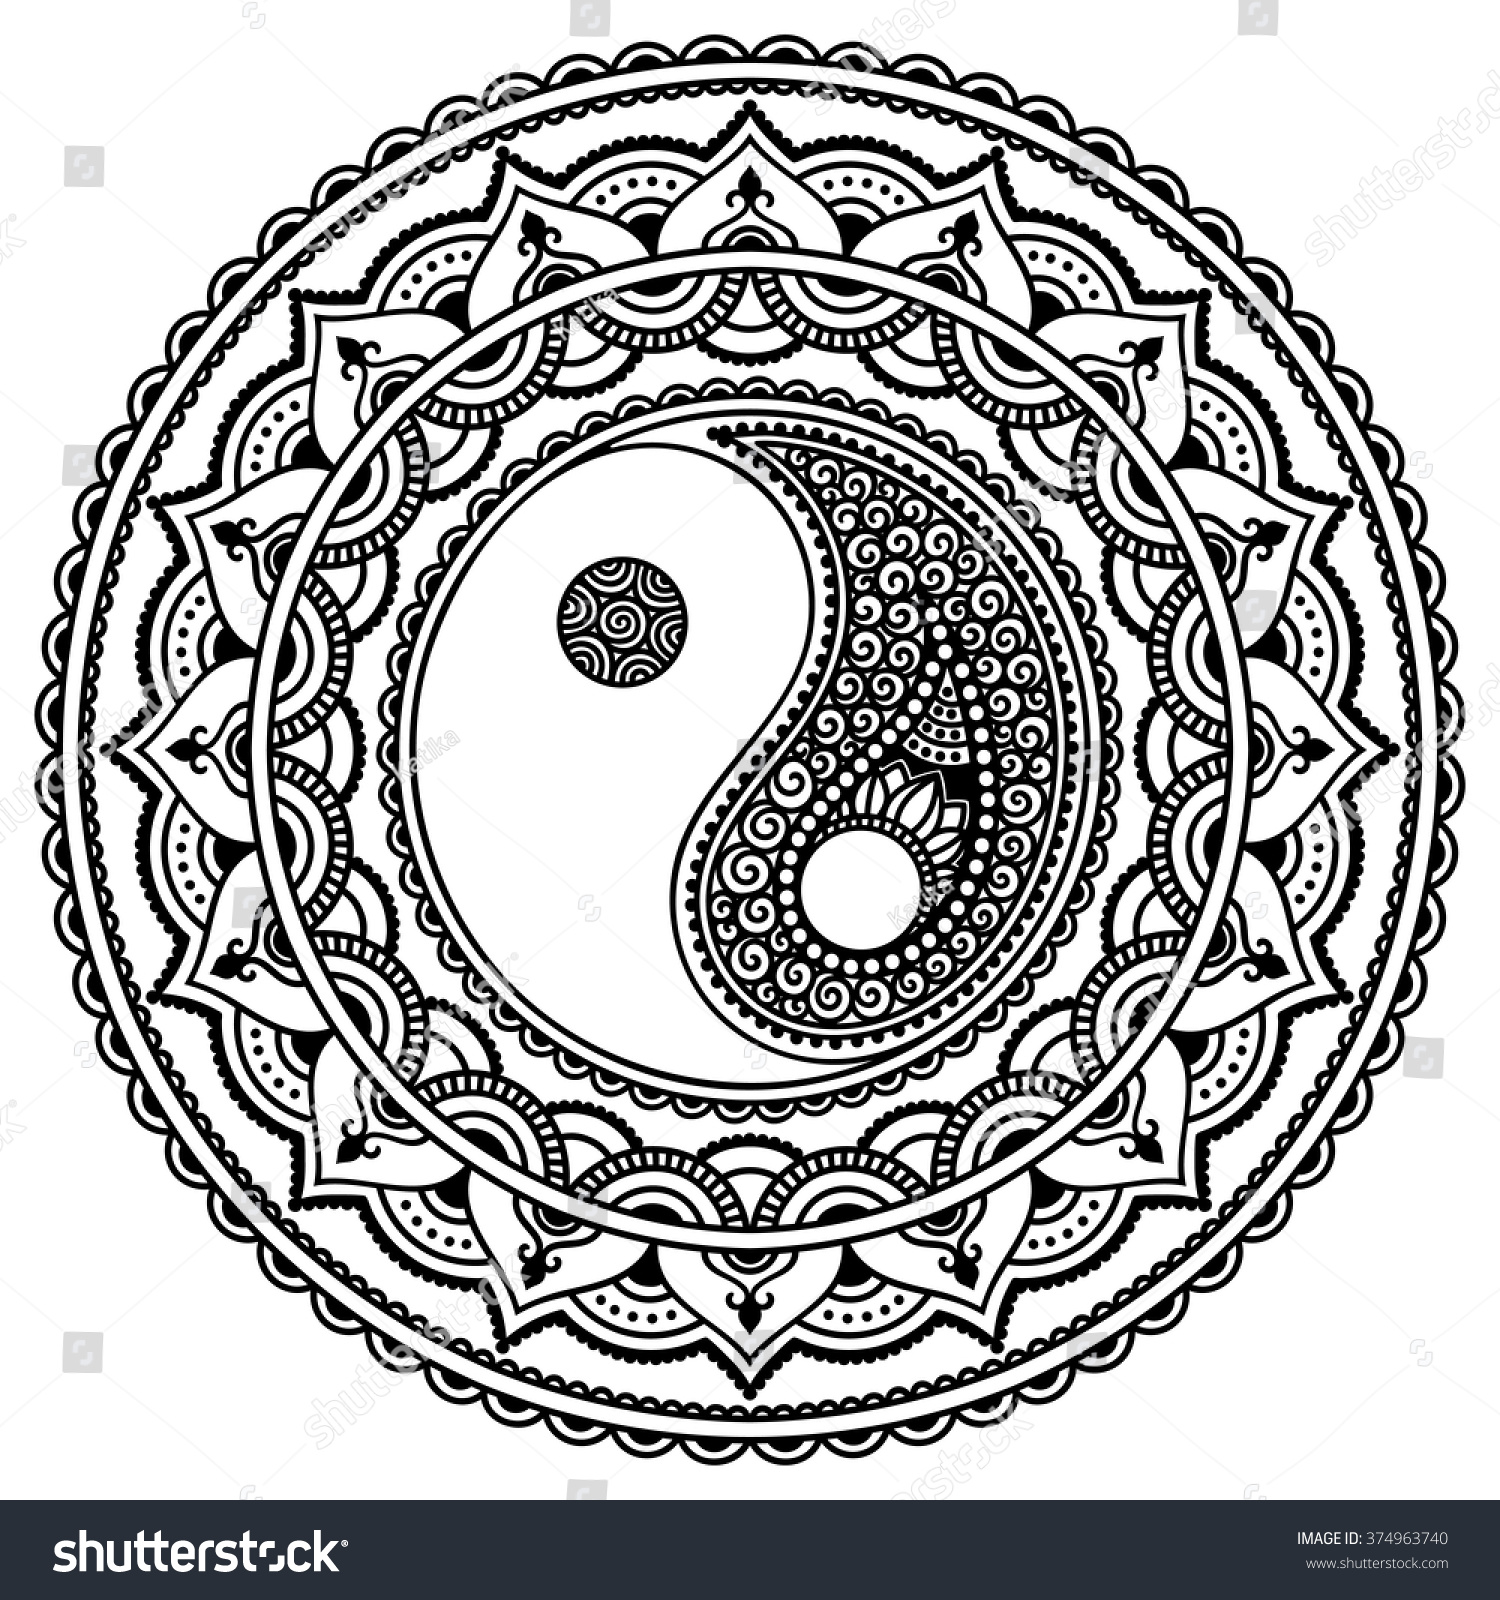 Vector Henna Tatoo Mandala Yinyang Decorative Stock Vector ...